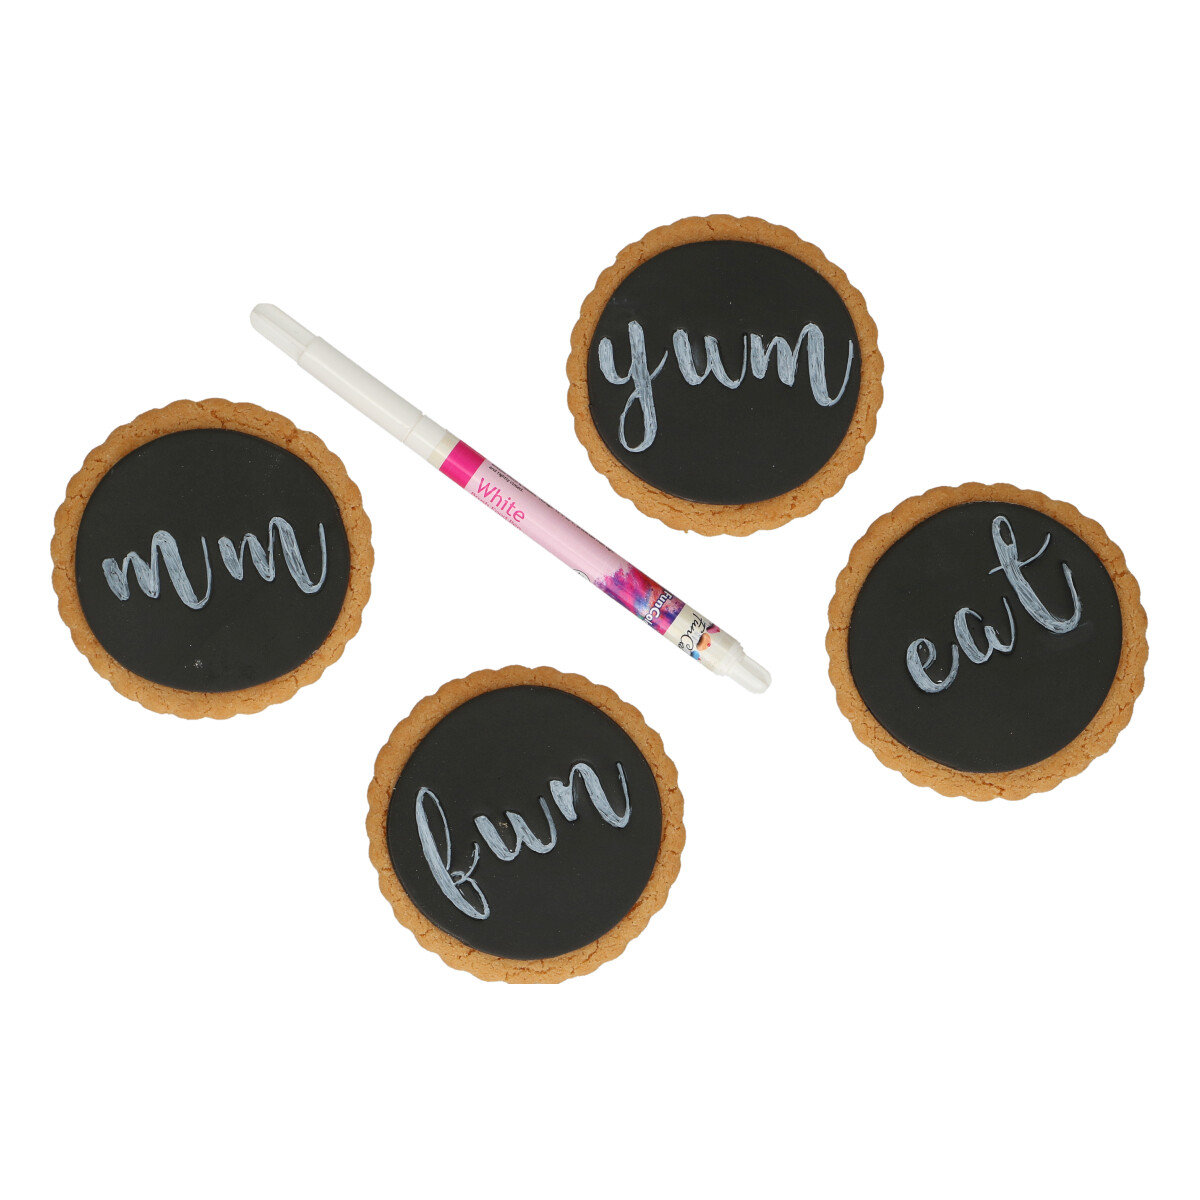 FunCakes Edible Brush Food Pen -WHITE -Βρώσιμος Μαρκαδόρος με Μύτη Πινέλου -Λευκός